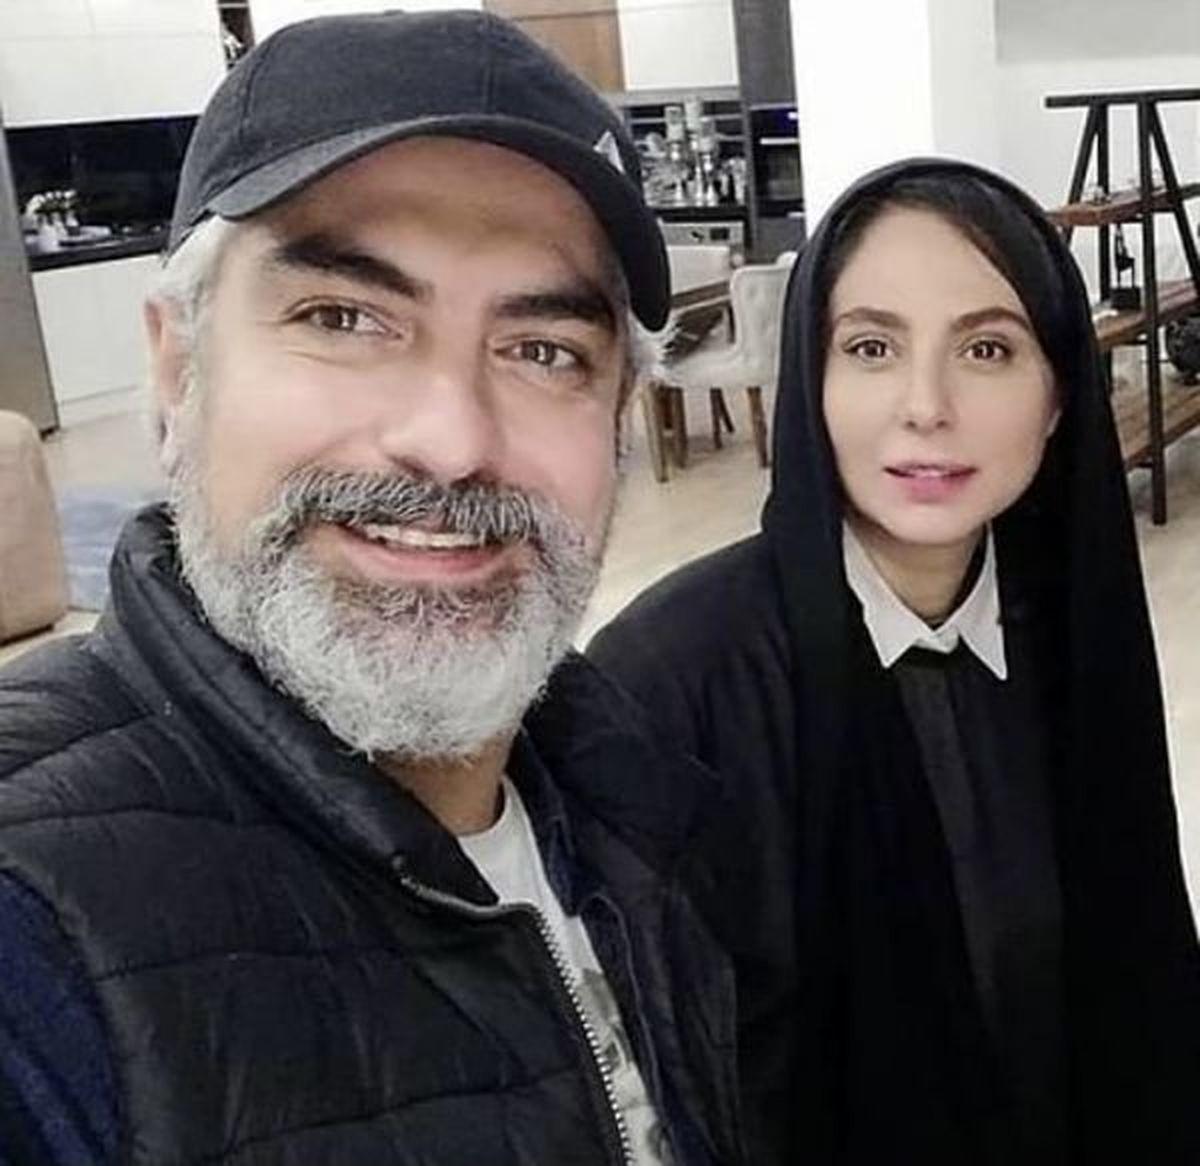 عاشقانه لاکچری مهدی پاکدل و همسر جدیدش؛ همسر دوم او کیست؟